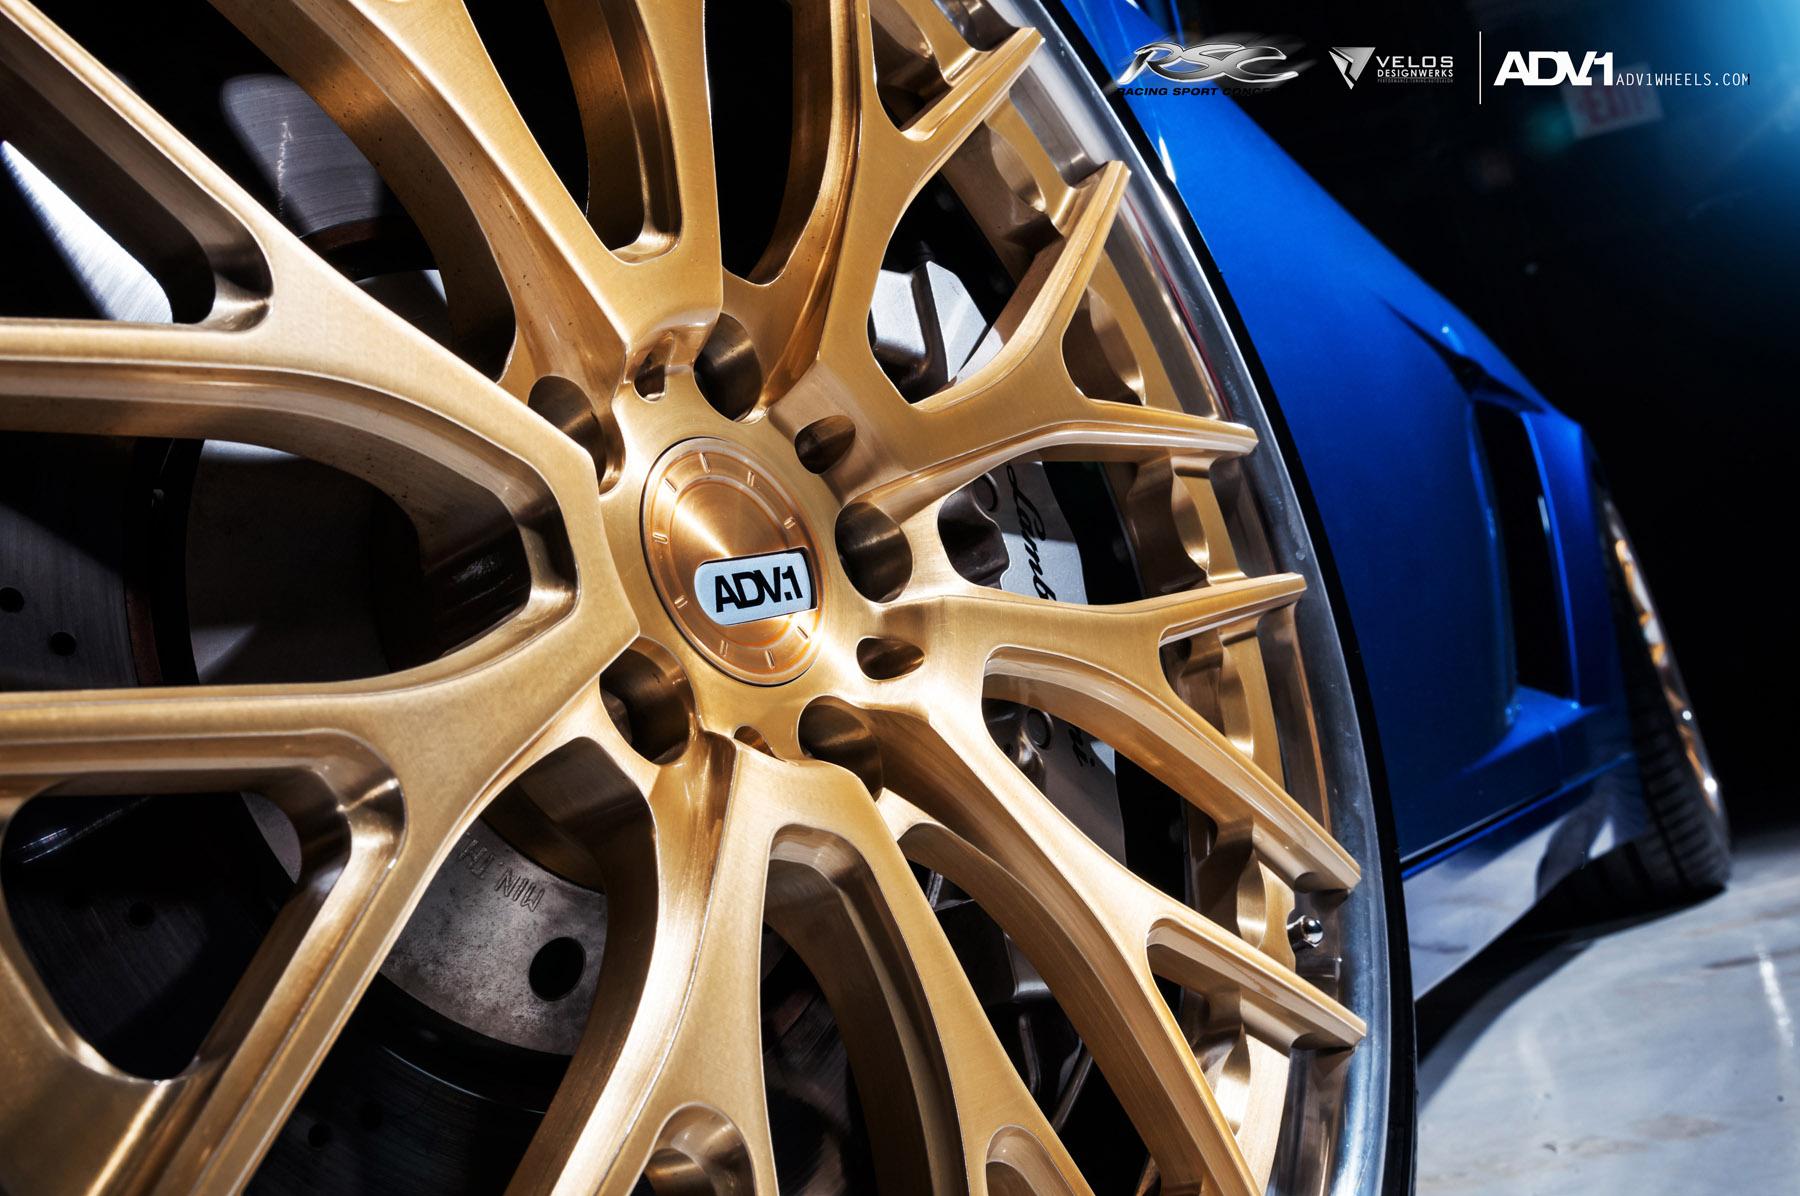 ADV.1 колеса Lamborghini Gallardo ADV10.0TS SL Gold Edition  - фотография №12